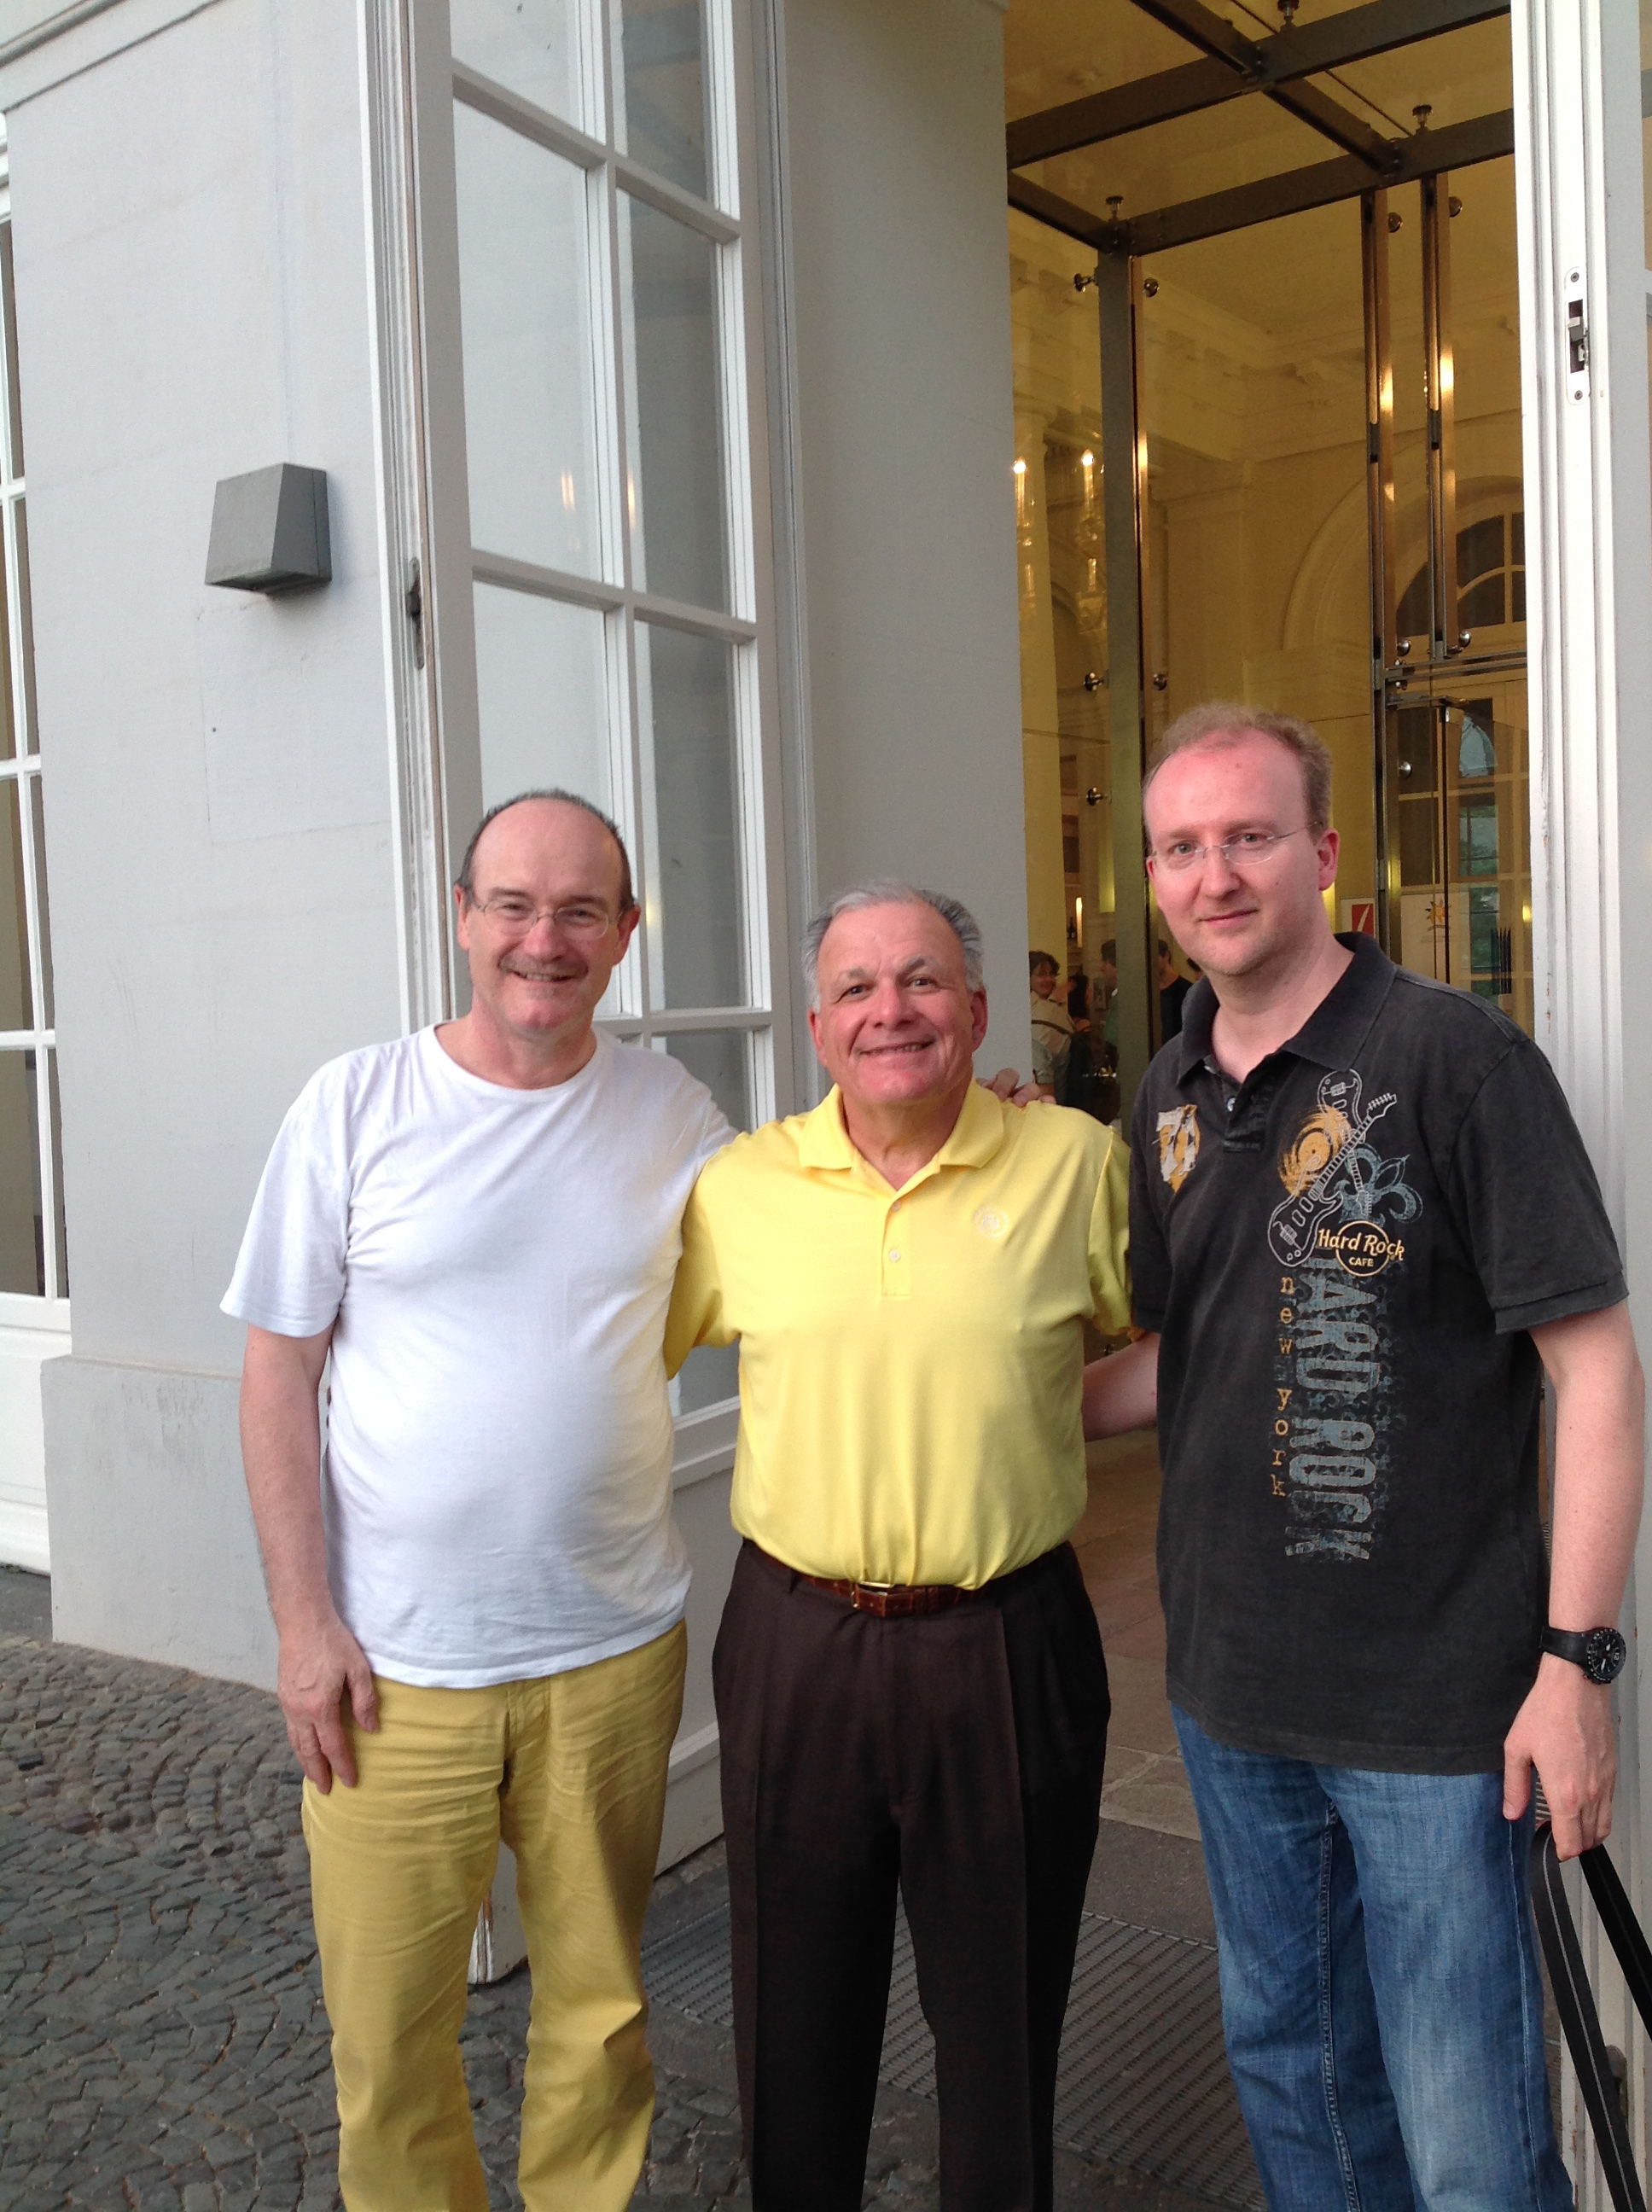 With John D'Addario and Thomas